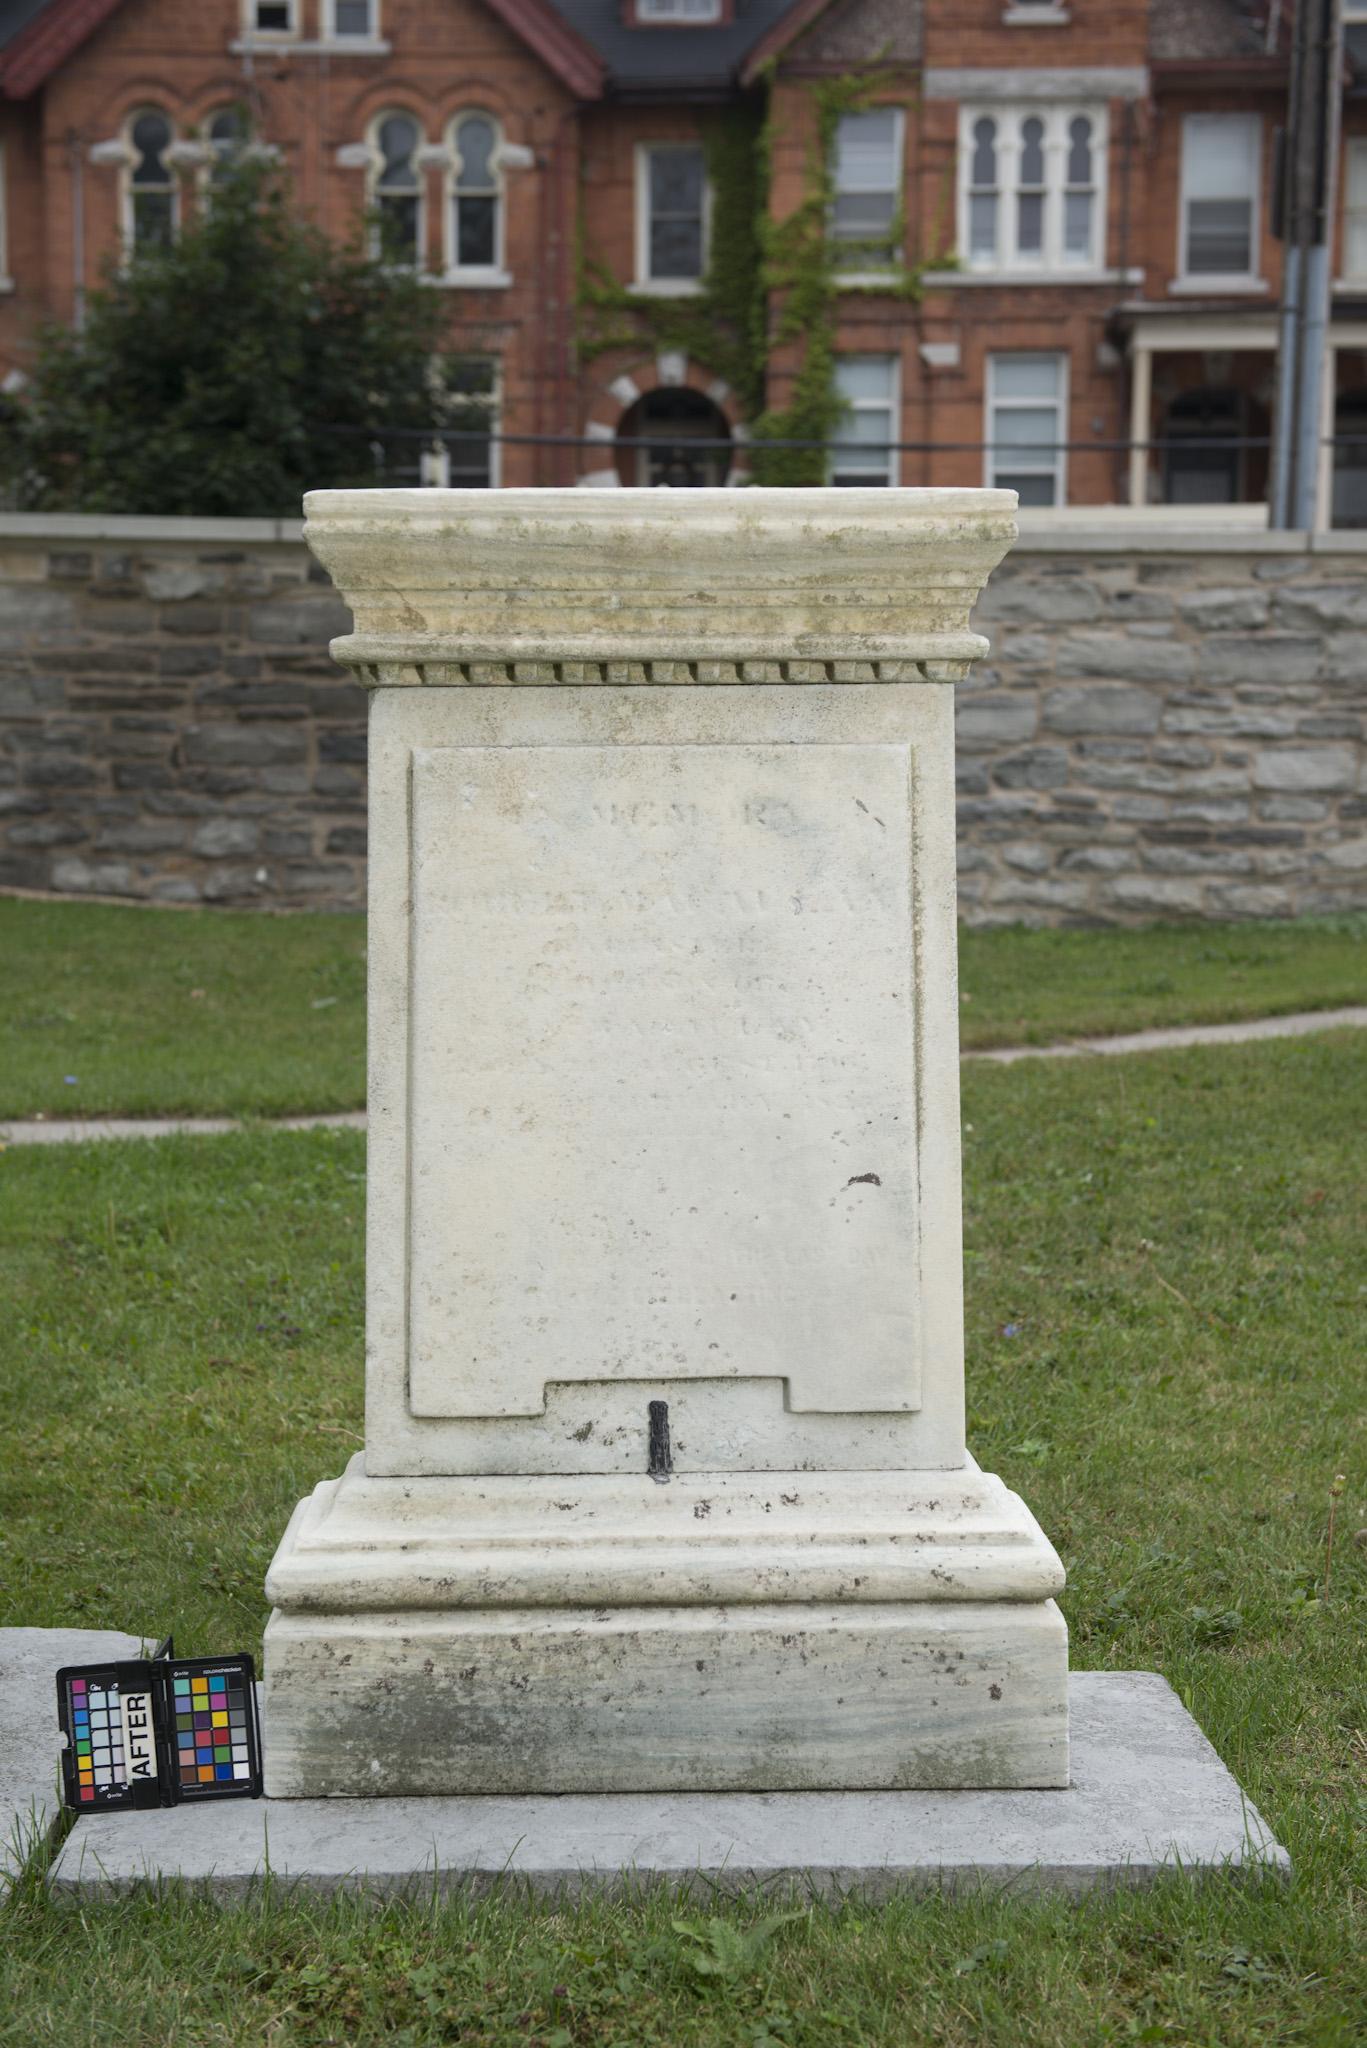 East side of marker for Robert Macaulay (Alex Gabov)